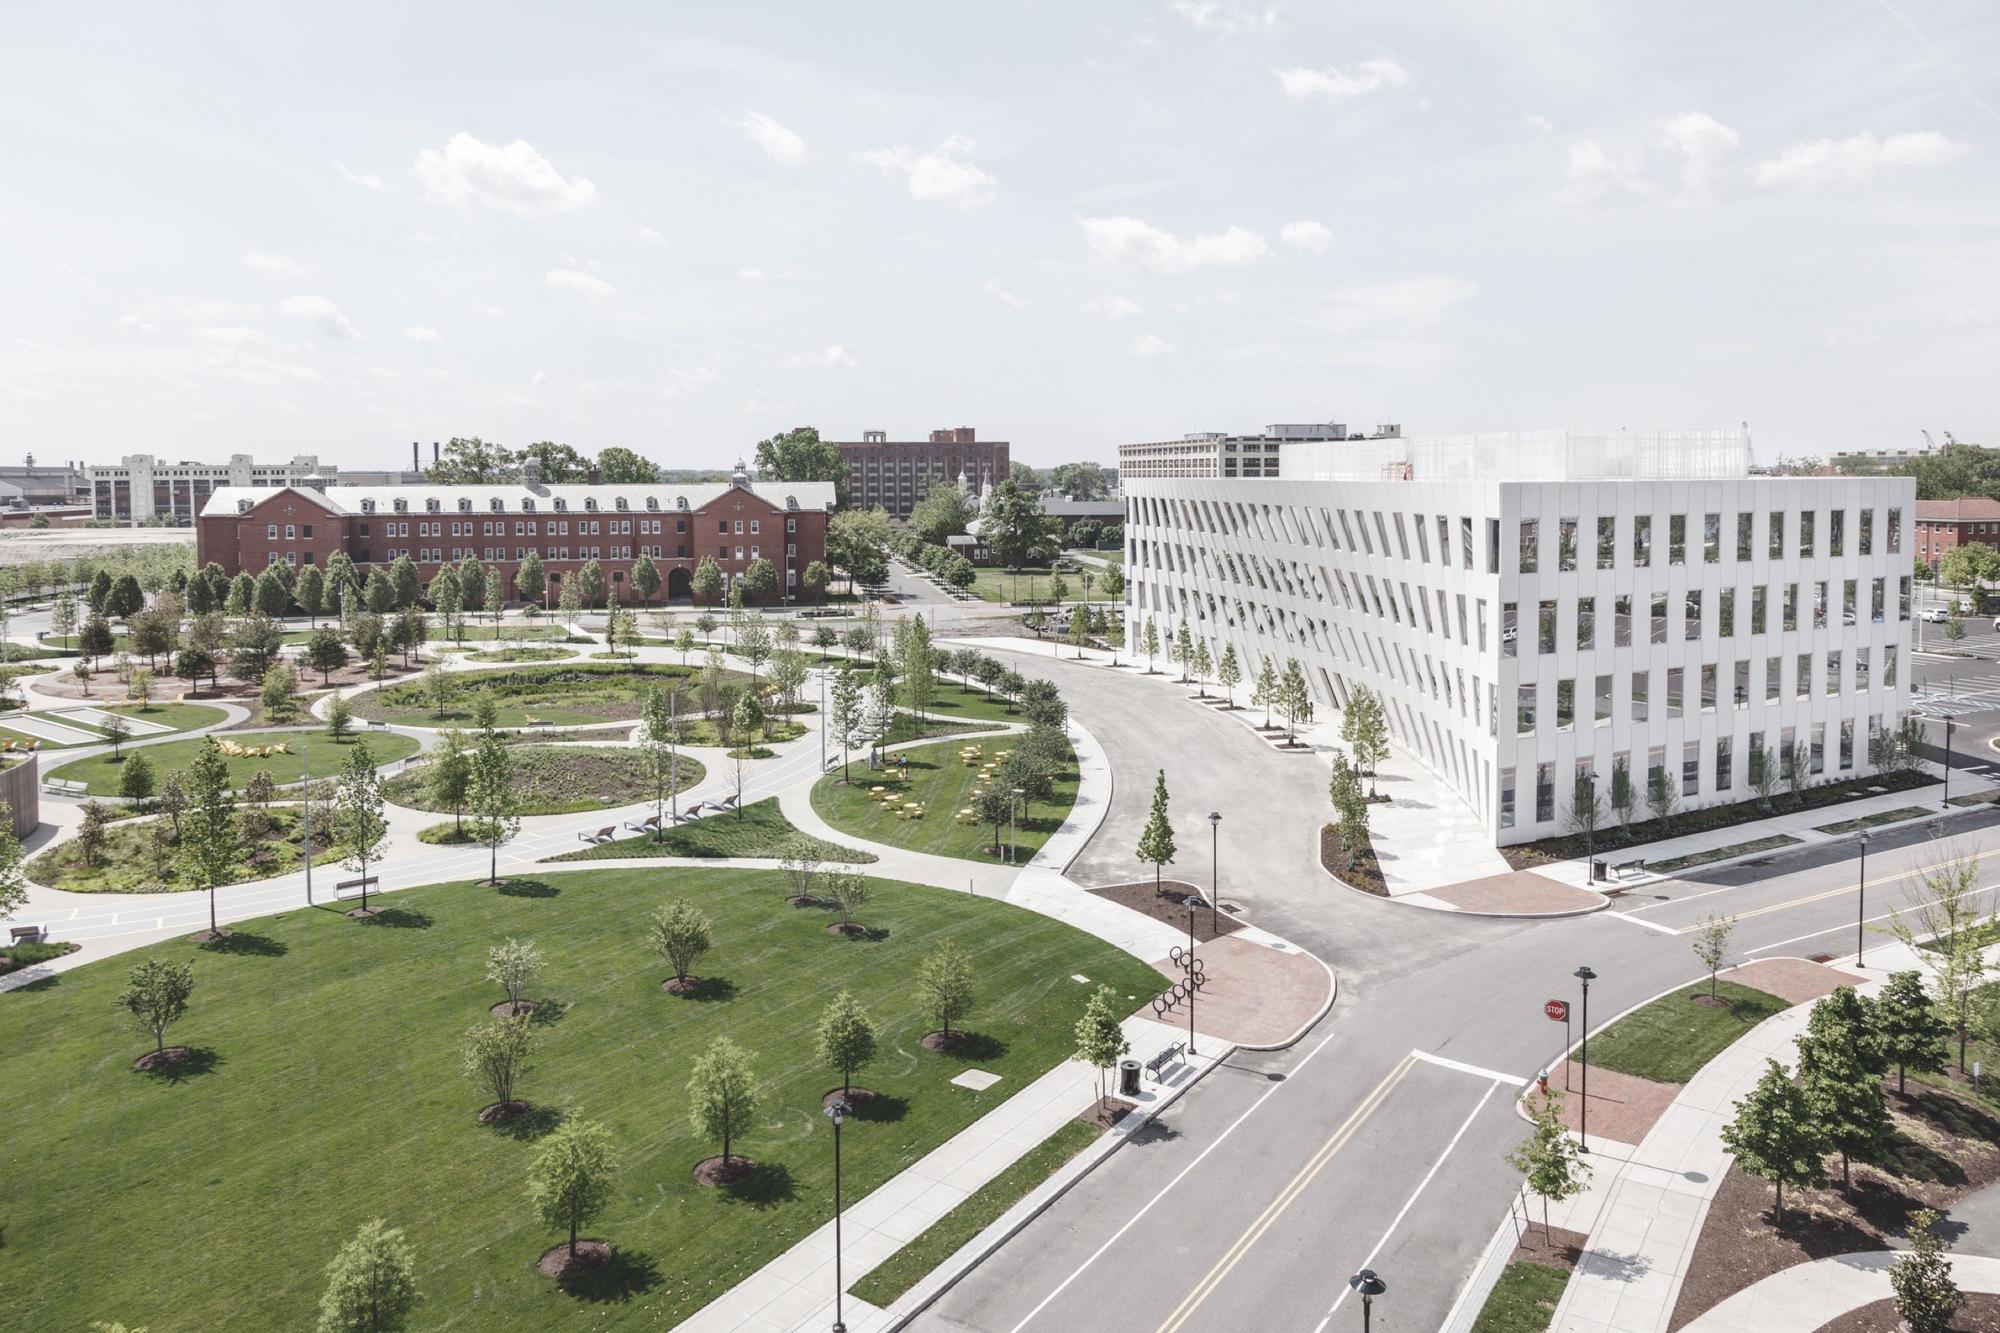 Office building design architecture Smart Bigs First Office Building Design Opens At The Philadelphia Navy Yard Rasmus Hjortshoj Office Buildings Tag Archdaily